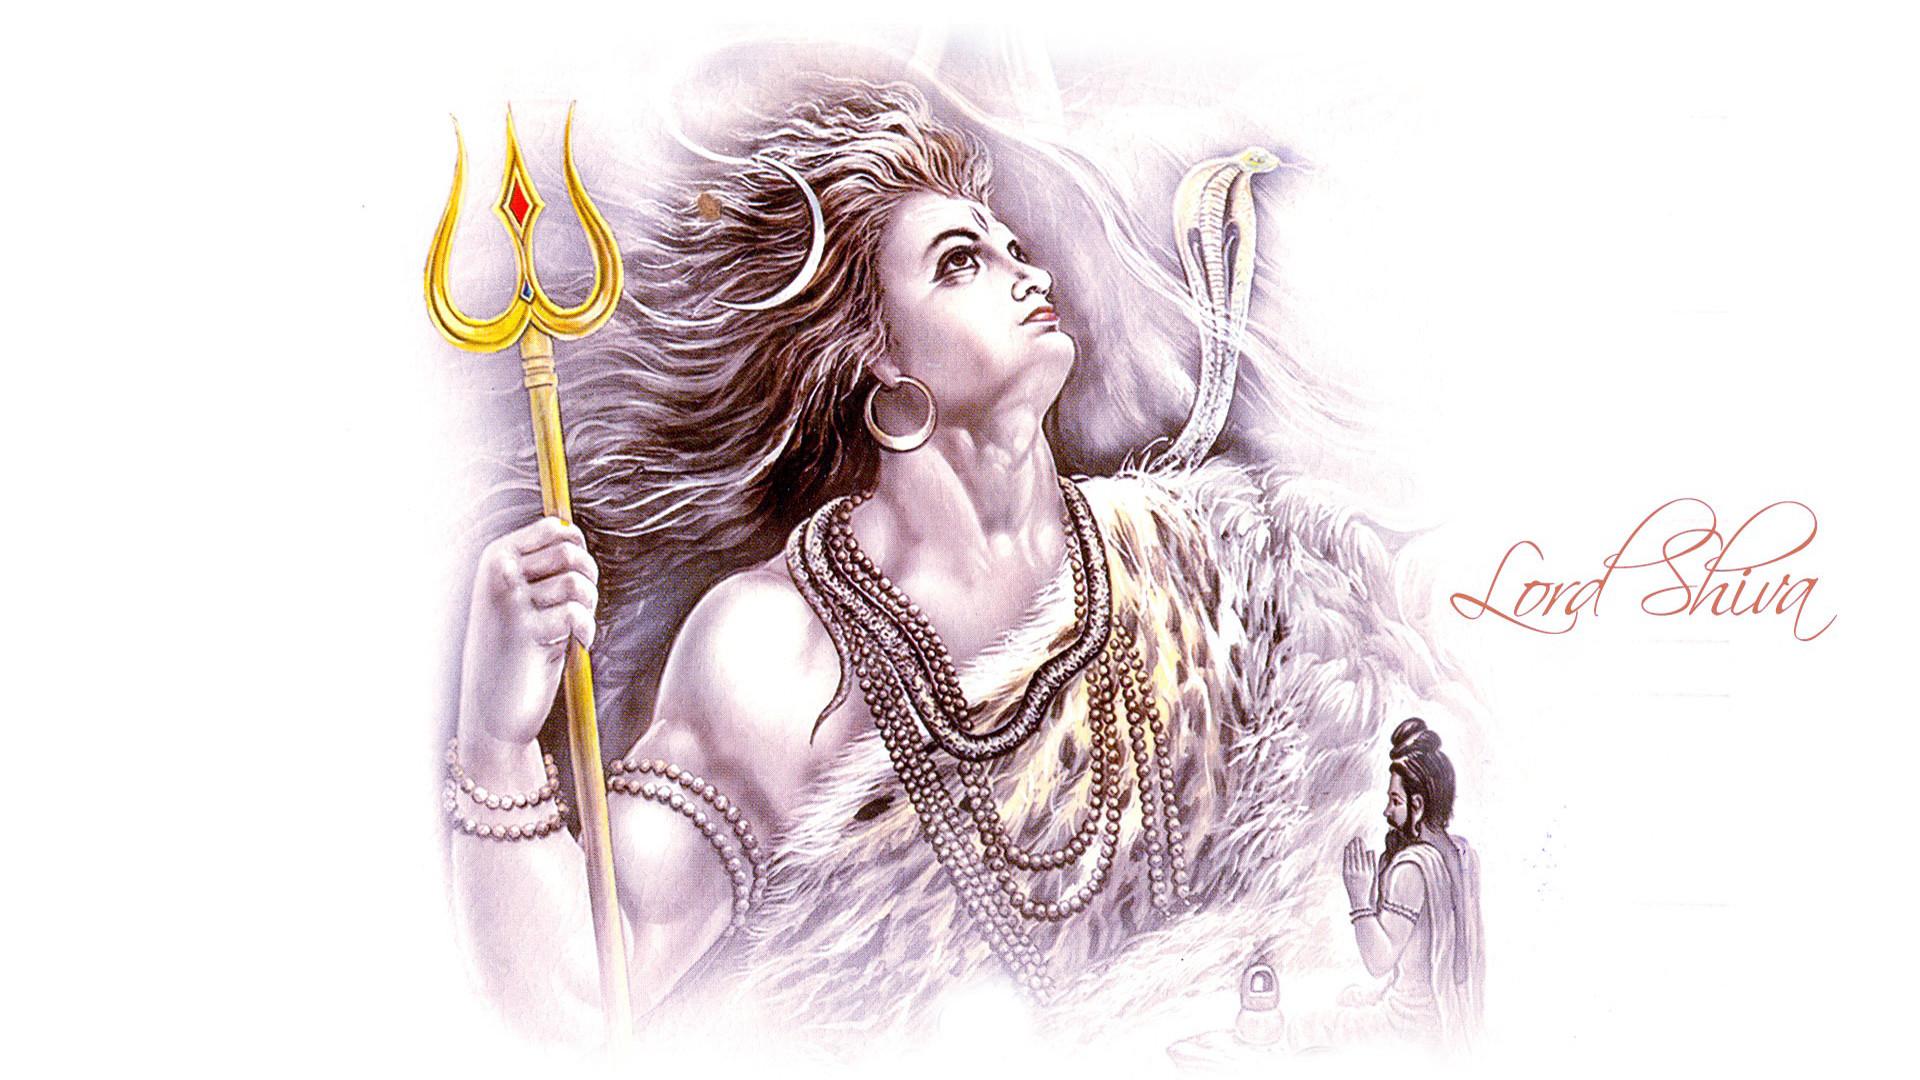 Lord Shiva Rudra Avatar Wallpapers